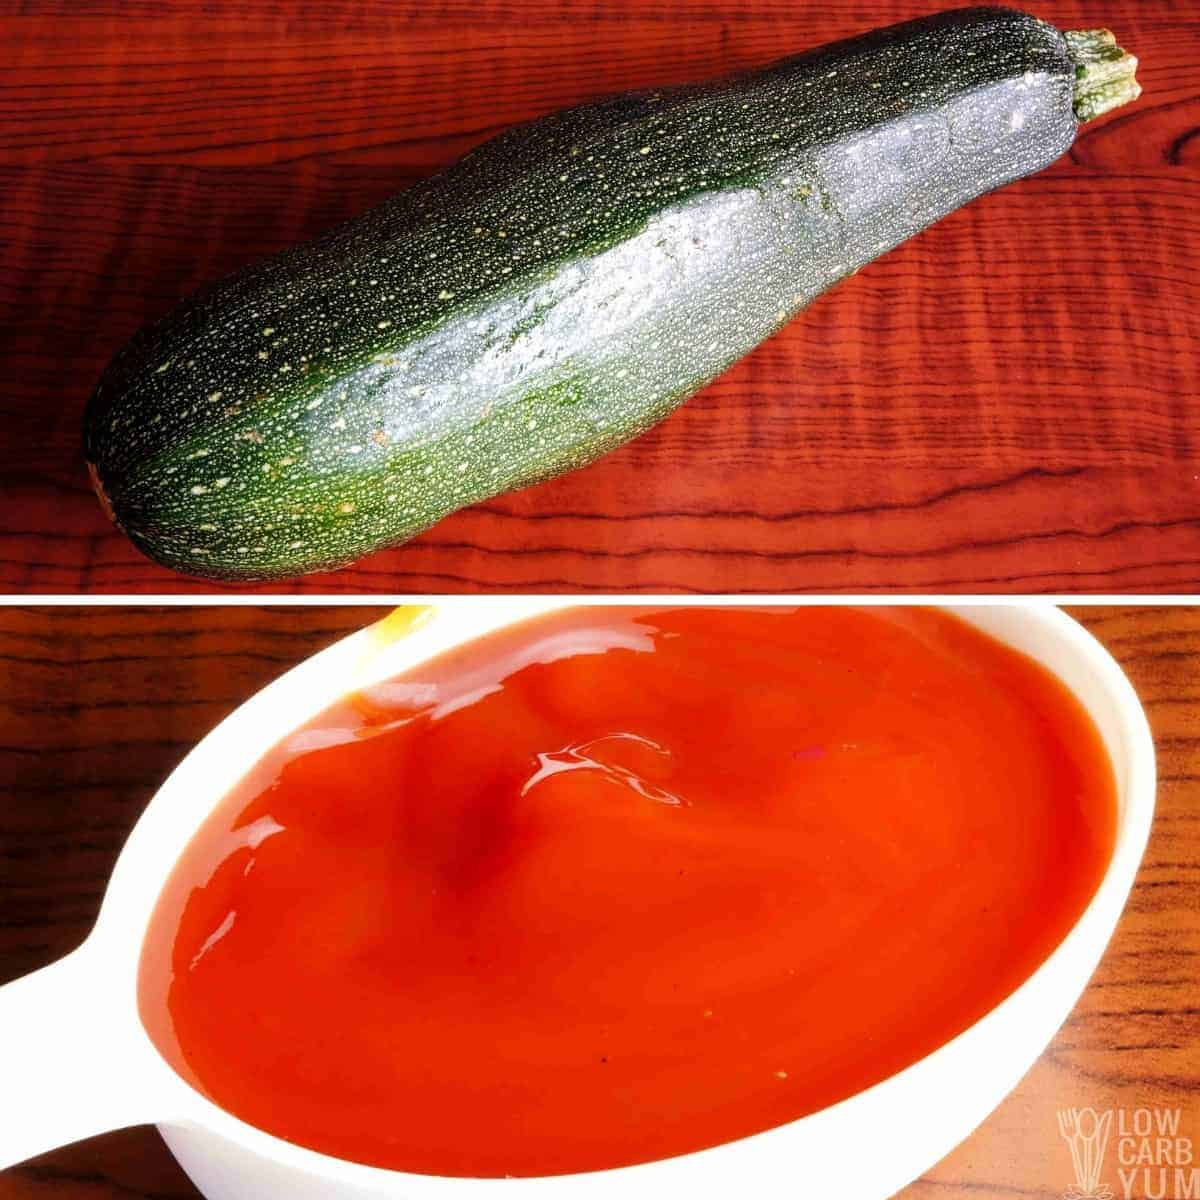 zucchini and pizza sauce